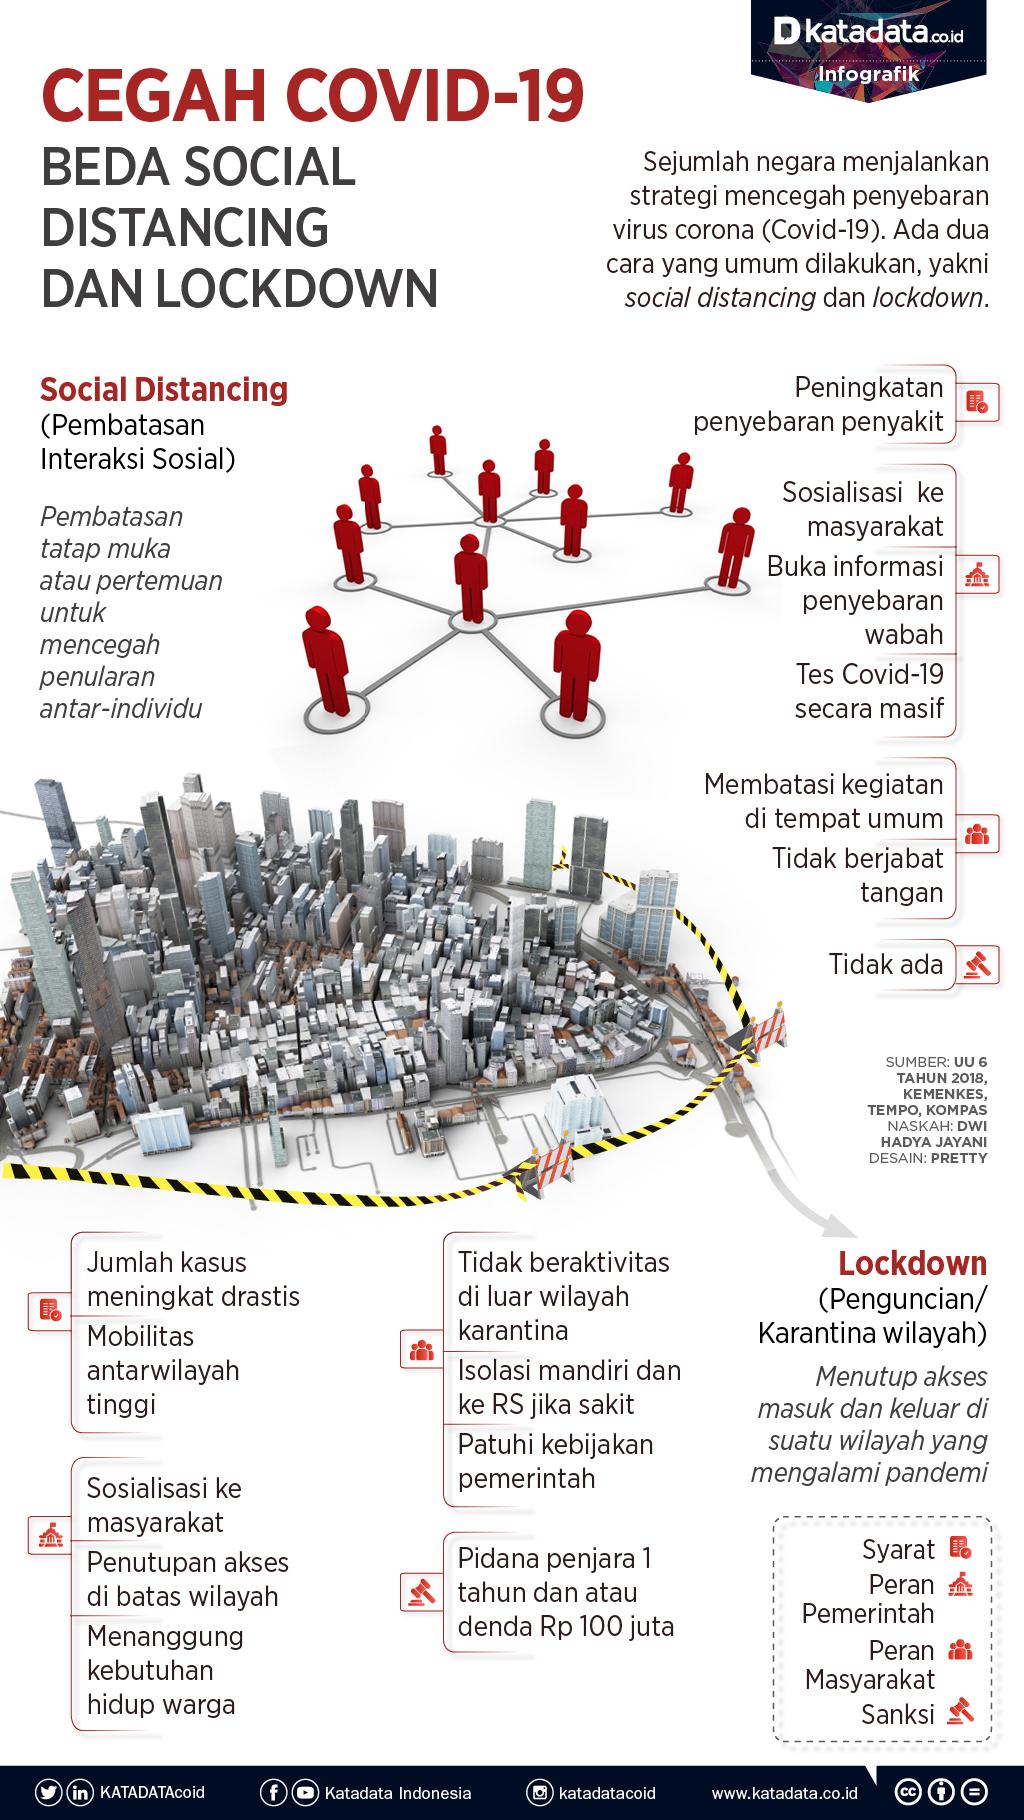 Interaksi Antar Wilayah : interaksi, antar, wilayah, Cegah, Penyebaran, Covid-19,, Antara, Social, Distancing, Lockdown, Infografik, Katadata.co.id